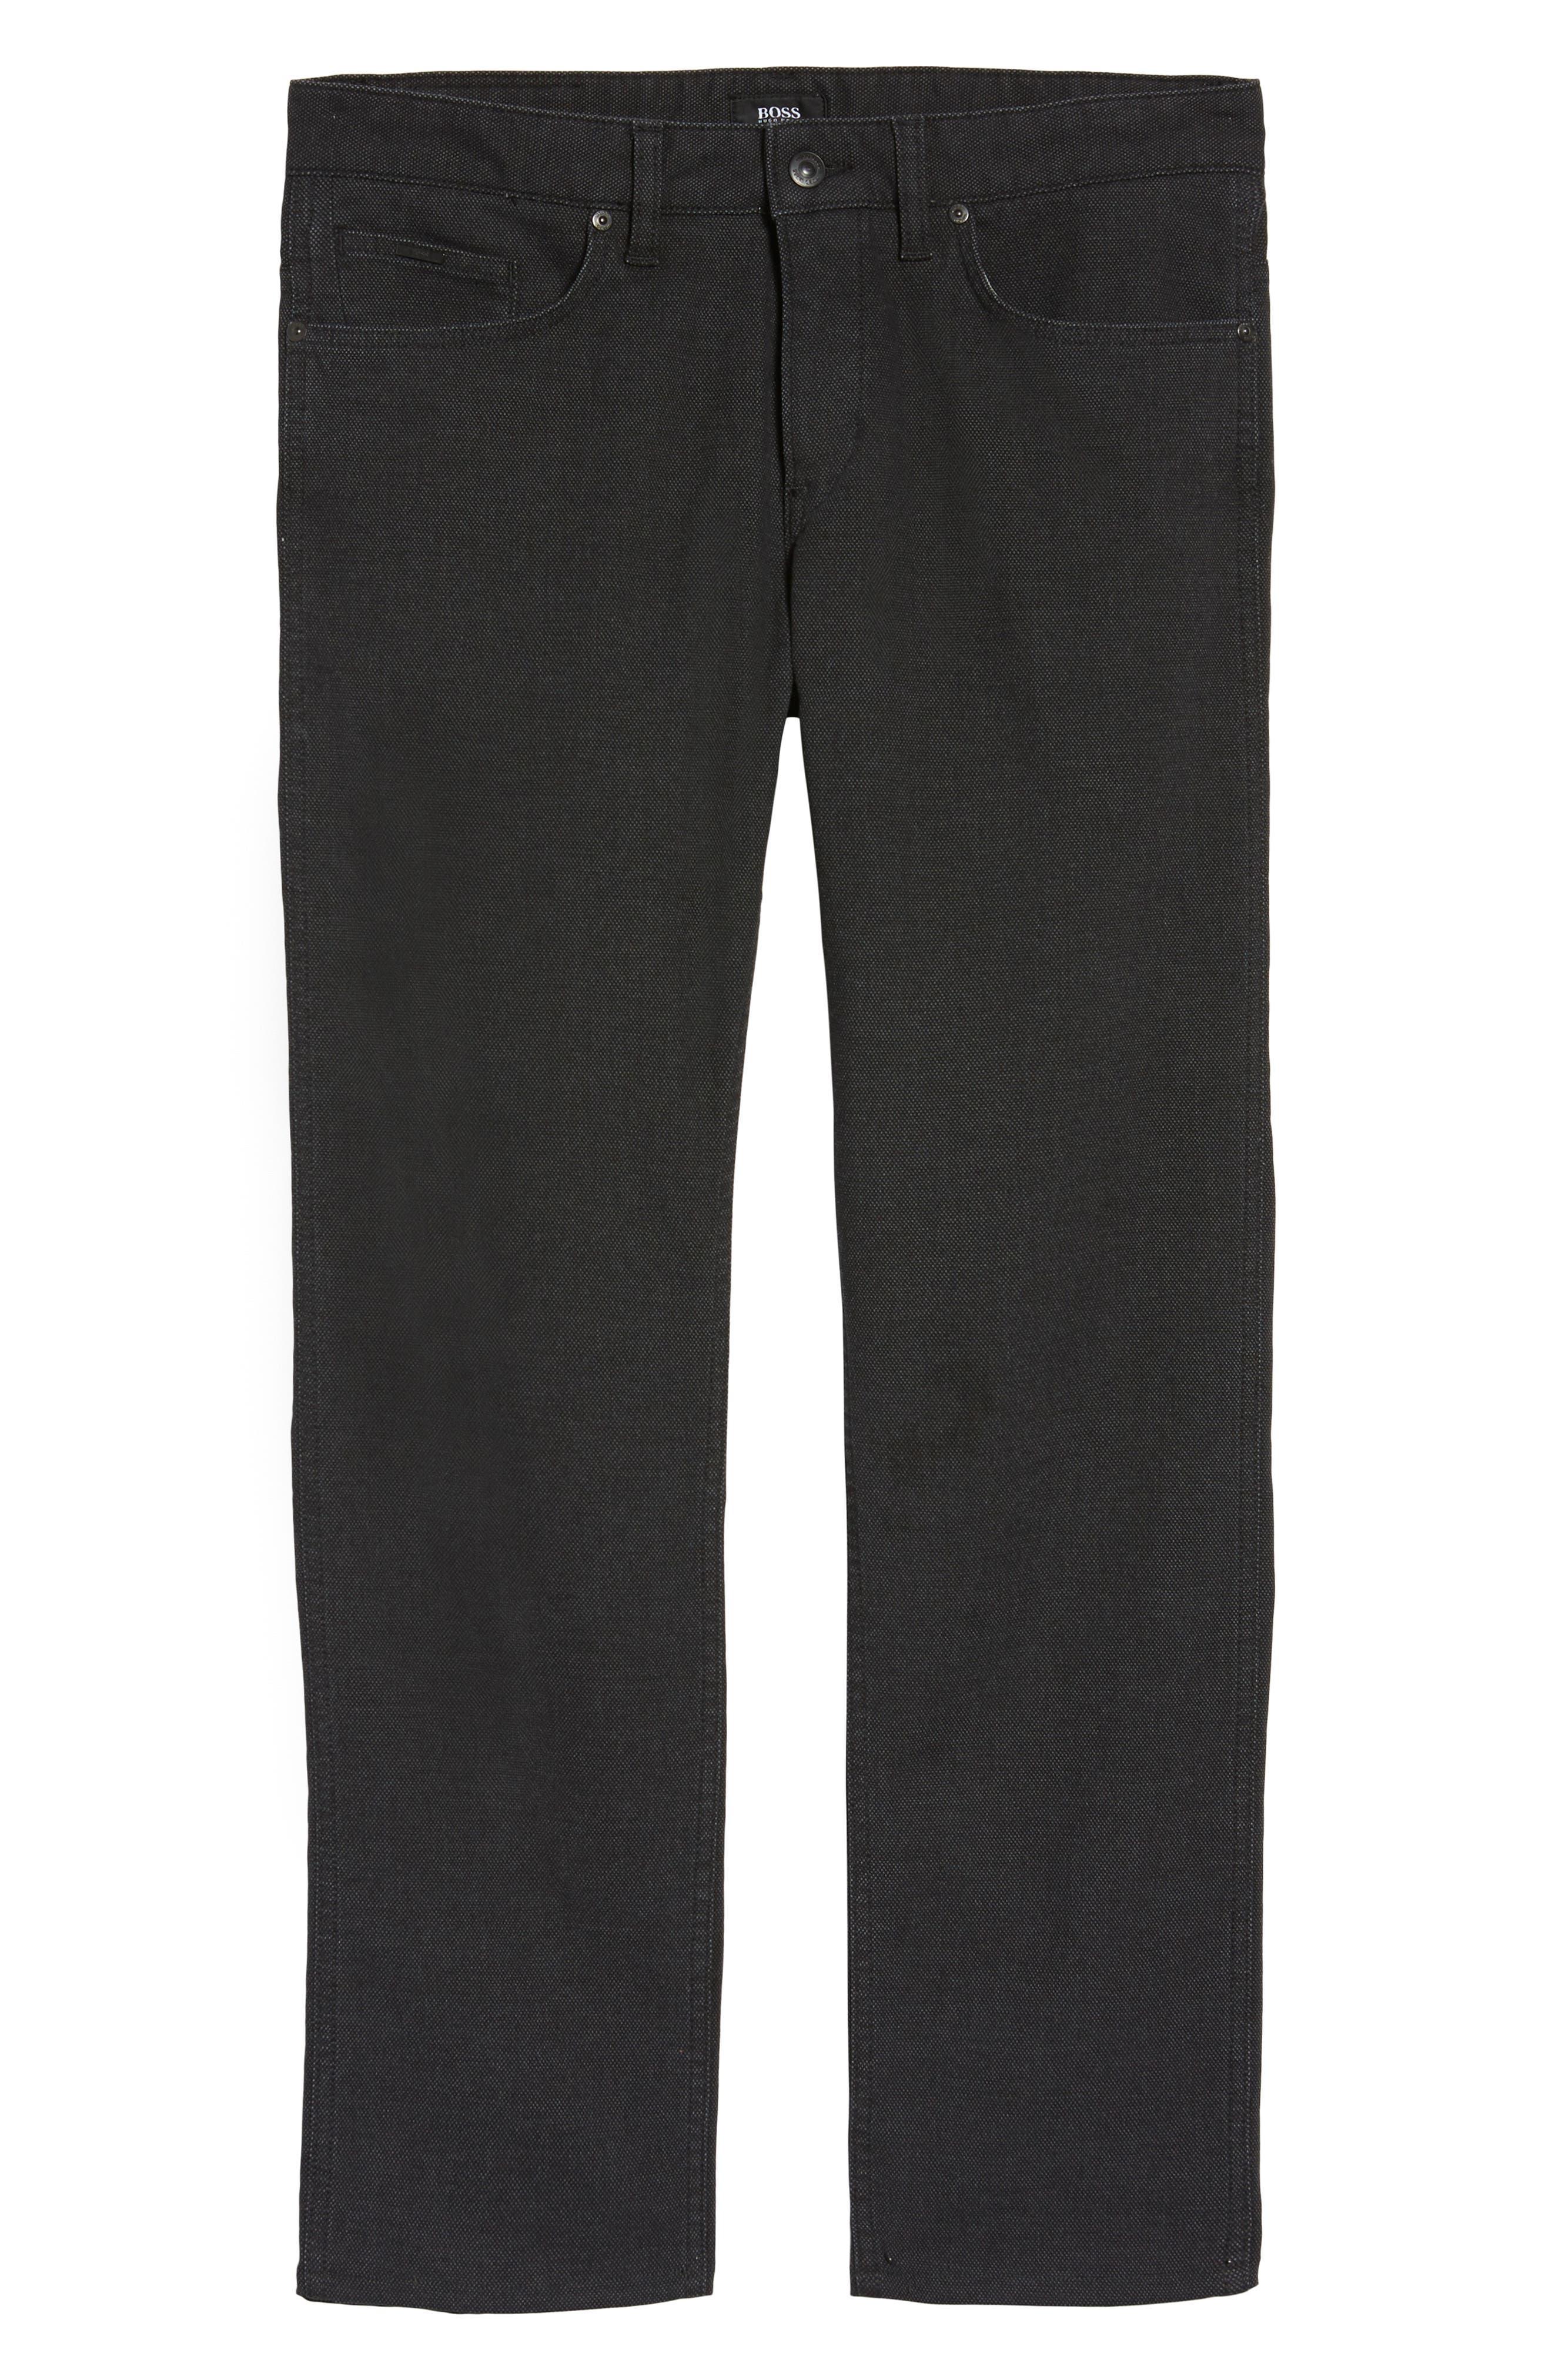 Delaware Slim 5-Pocket Pants,                             Alternate thumbnail 6, color,                             022